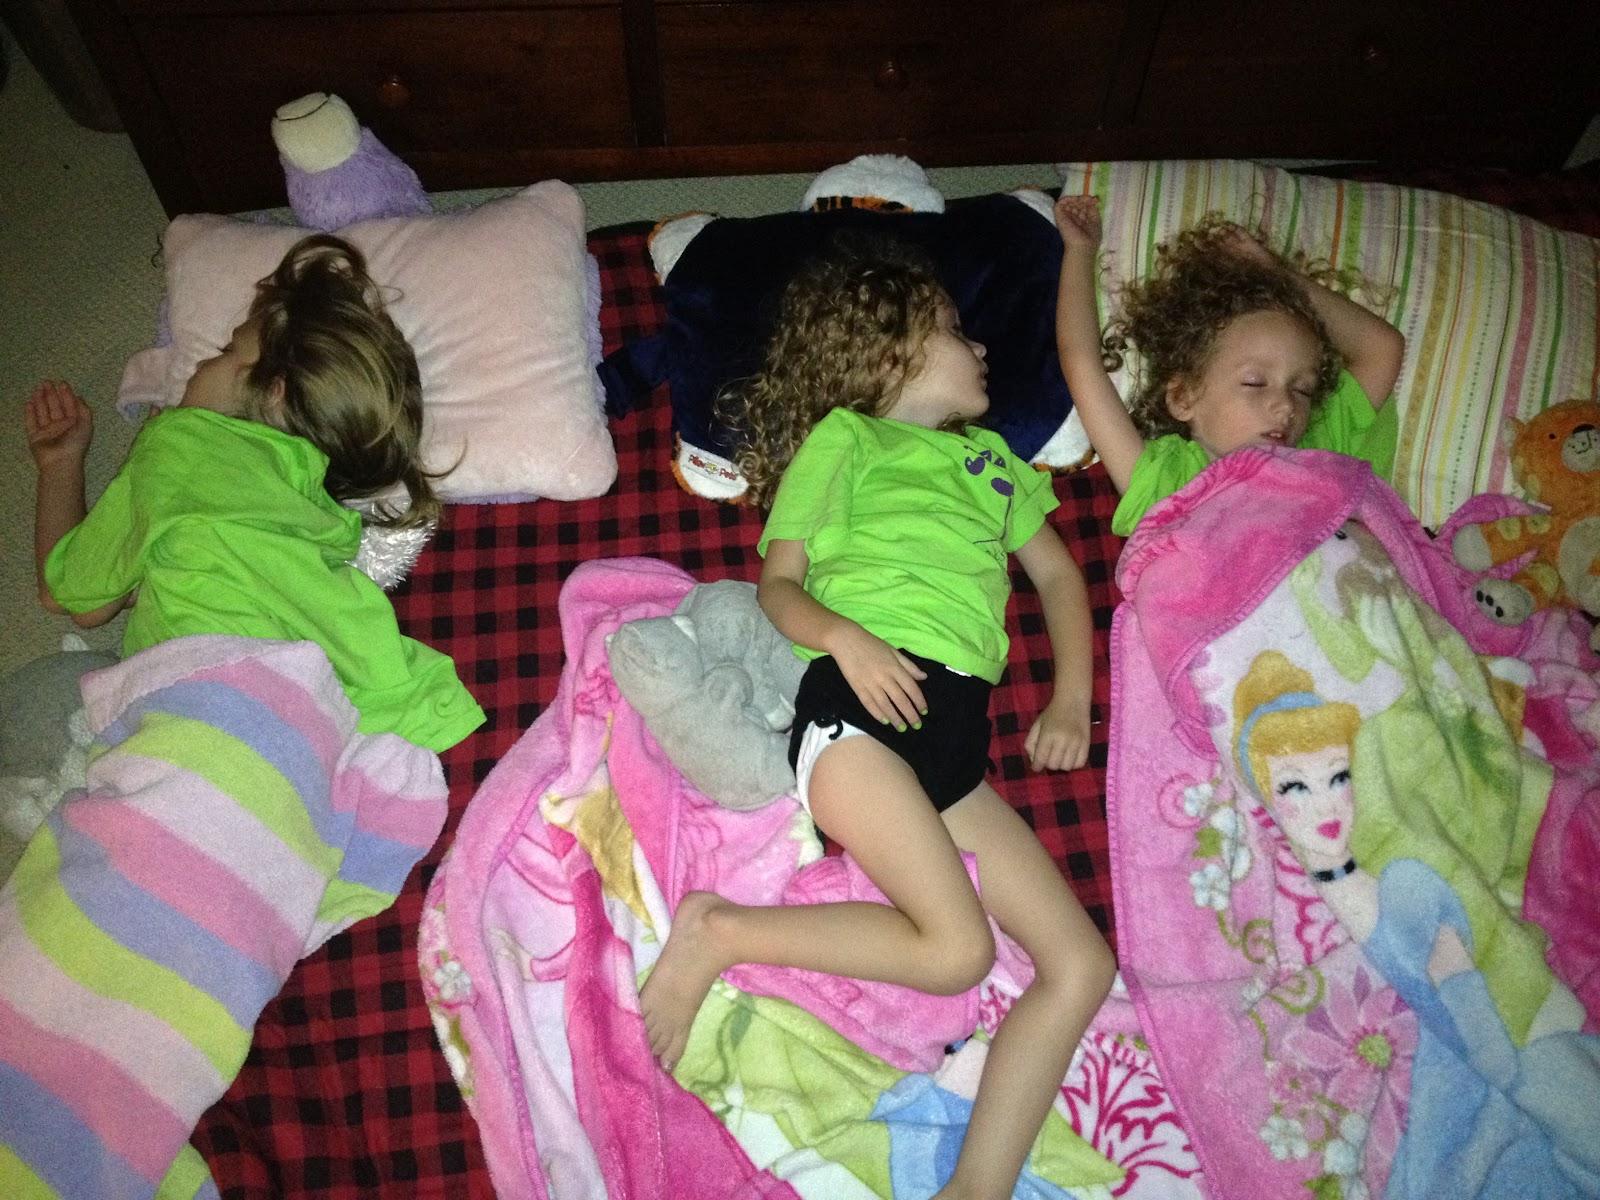 Sleepover little girls, sexy hot naked mixed girls